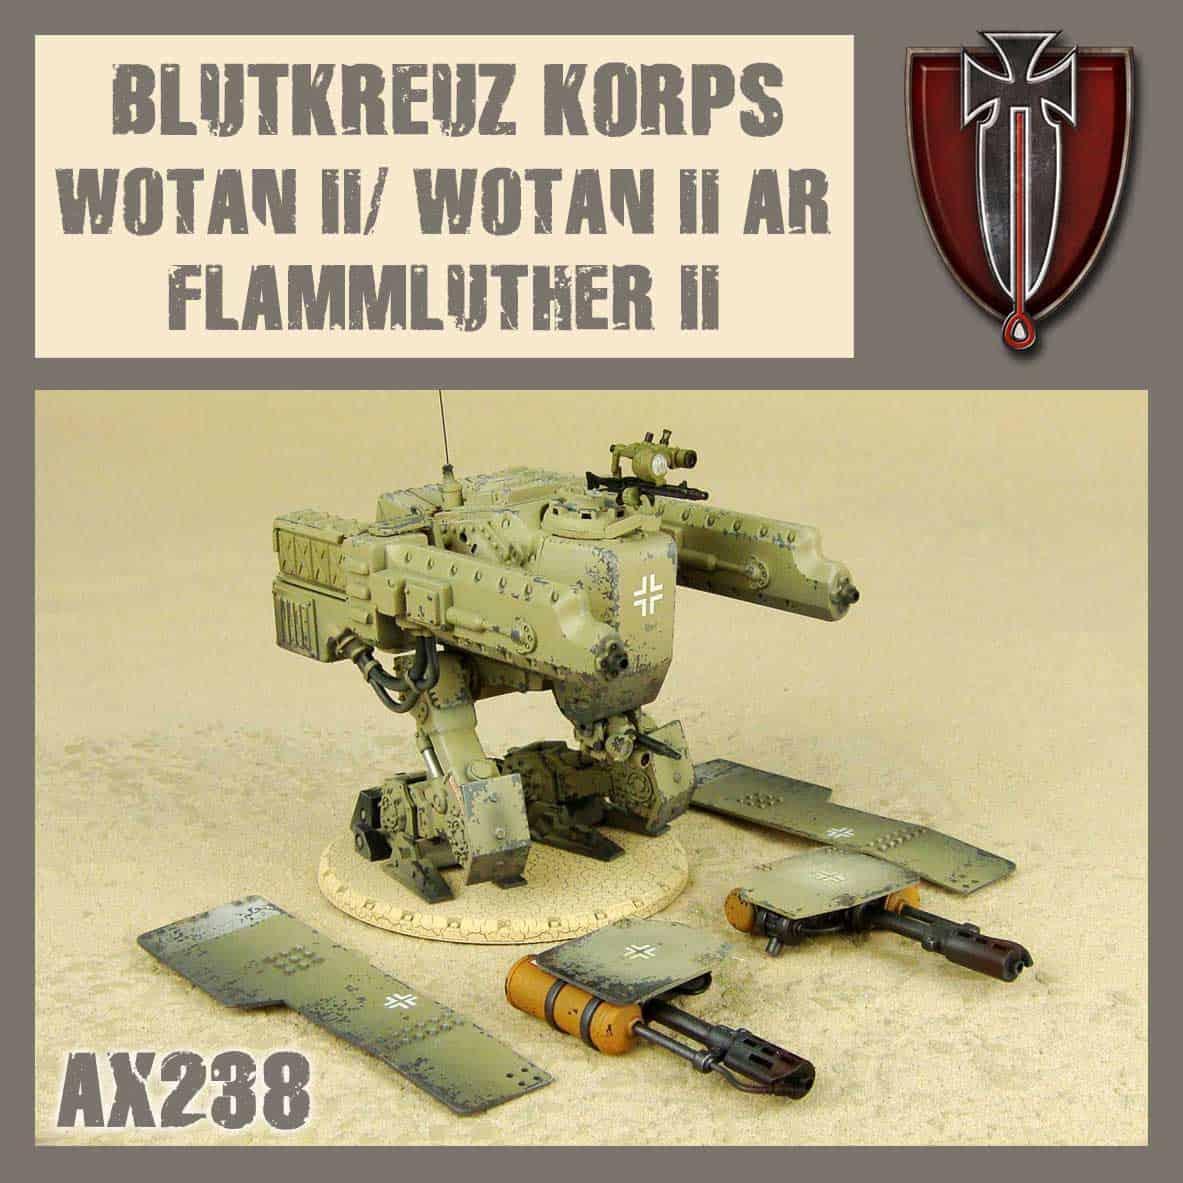 Flamm-Luther II / Wotan II / Wotan II AR